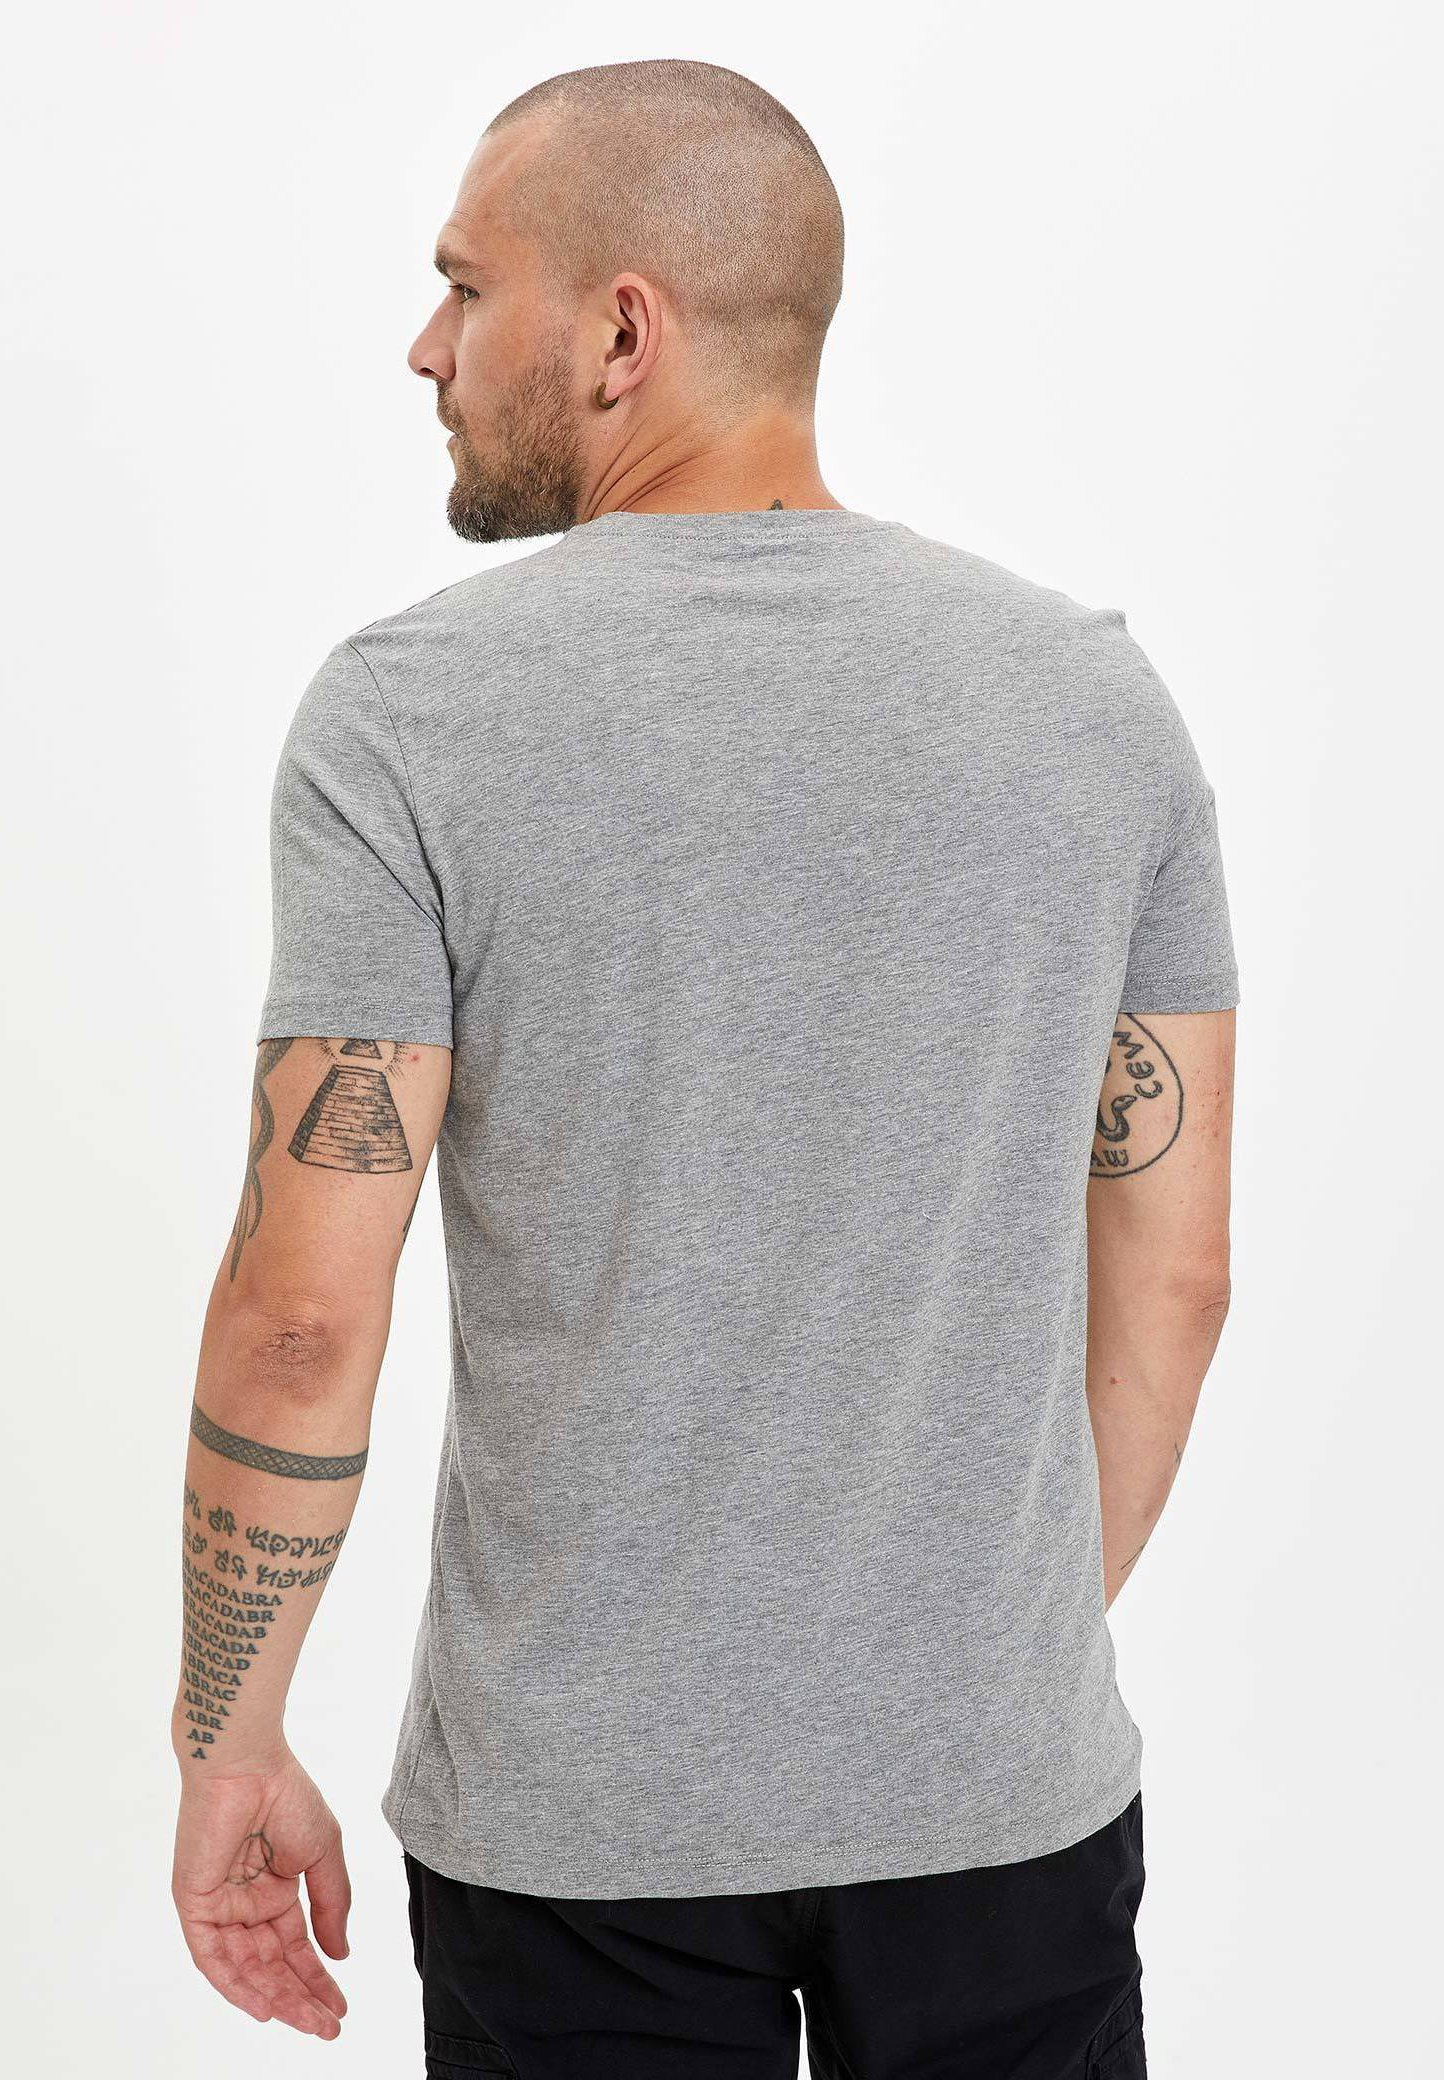 DeFacto Print T-shirt - grey 62Siw